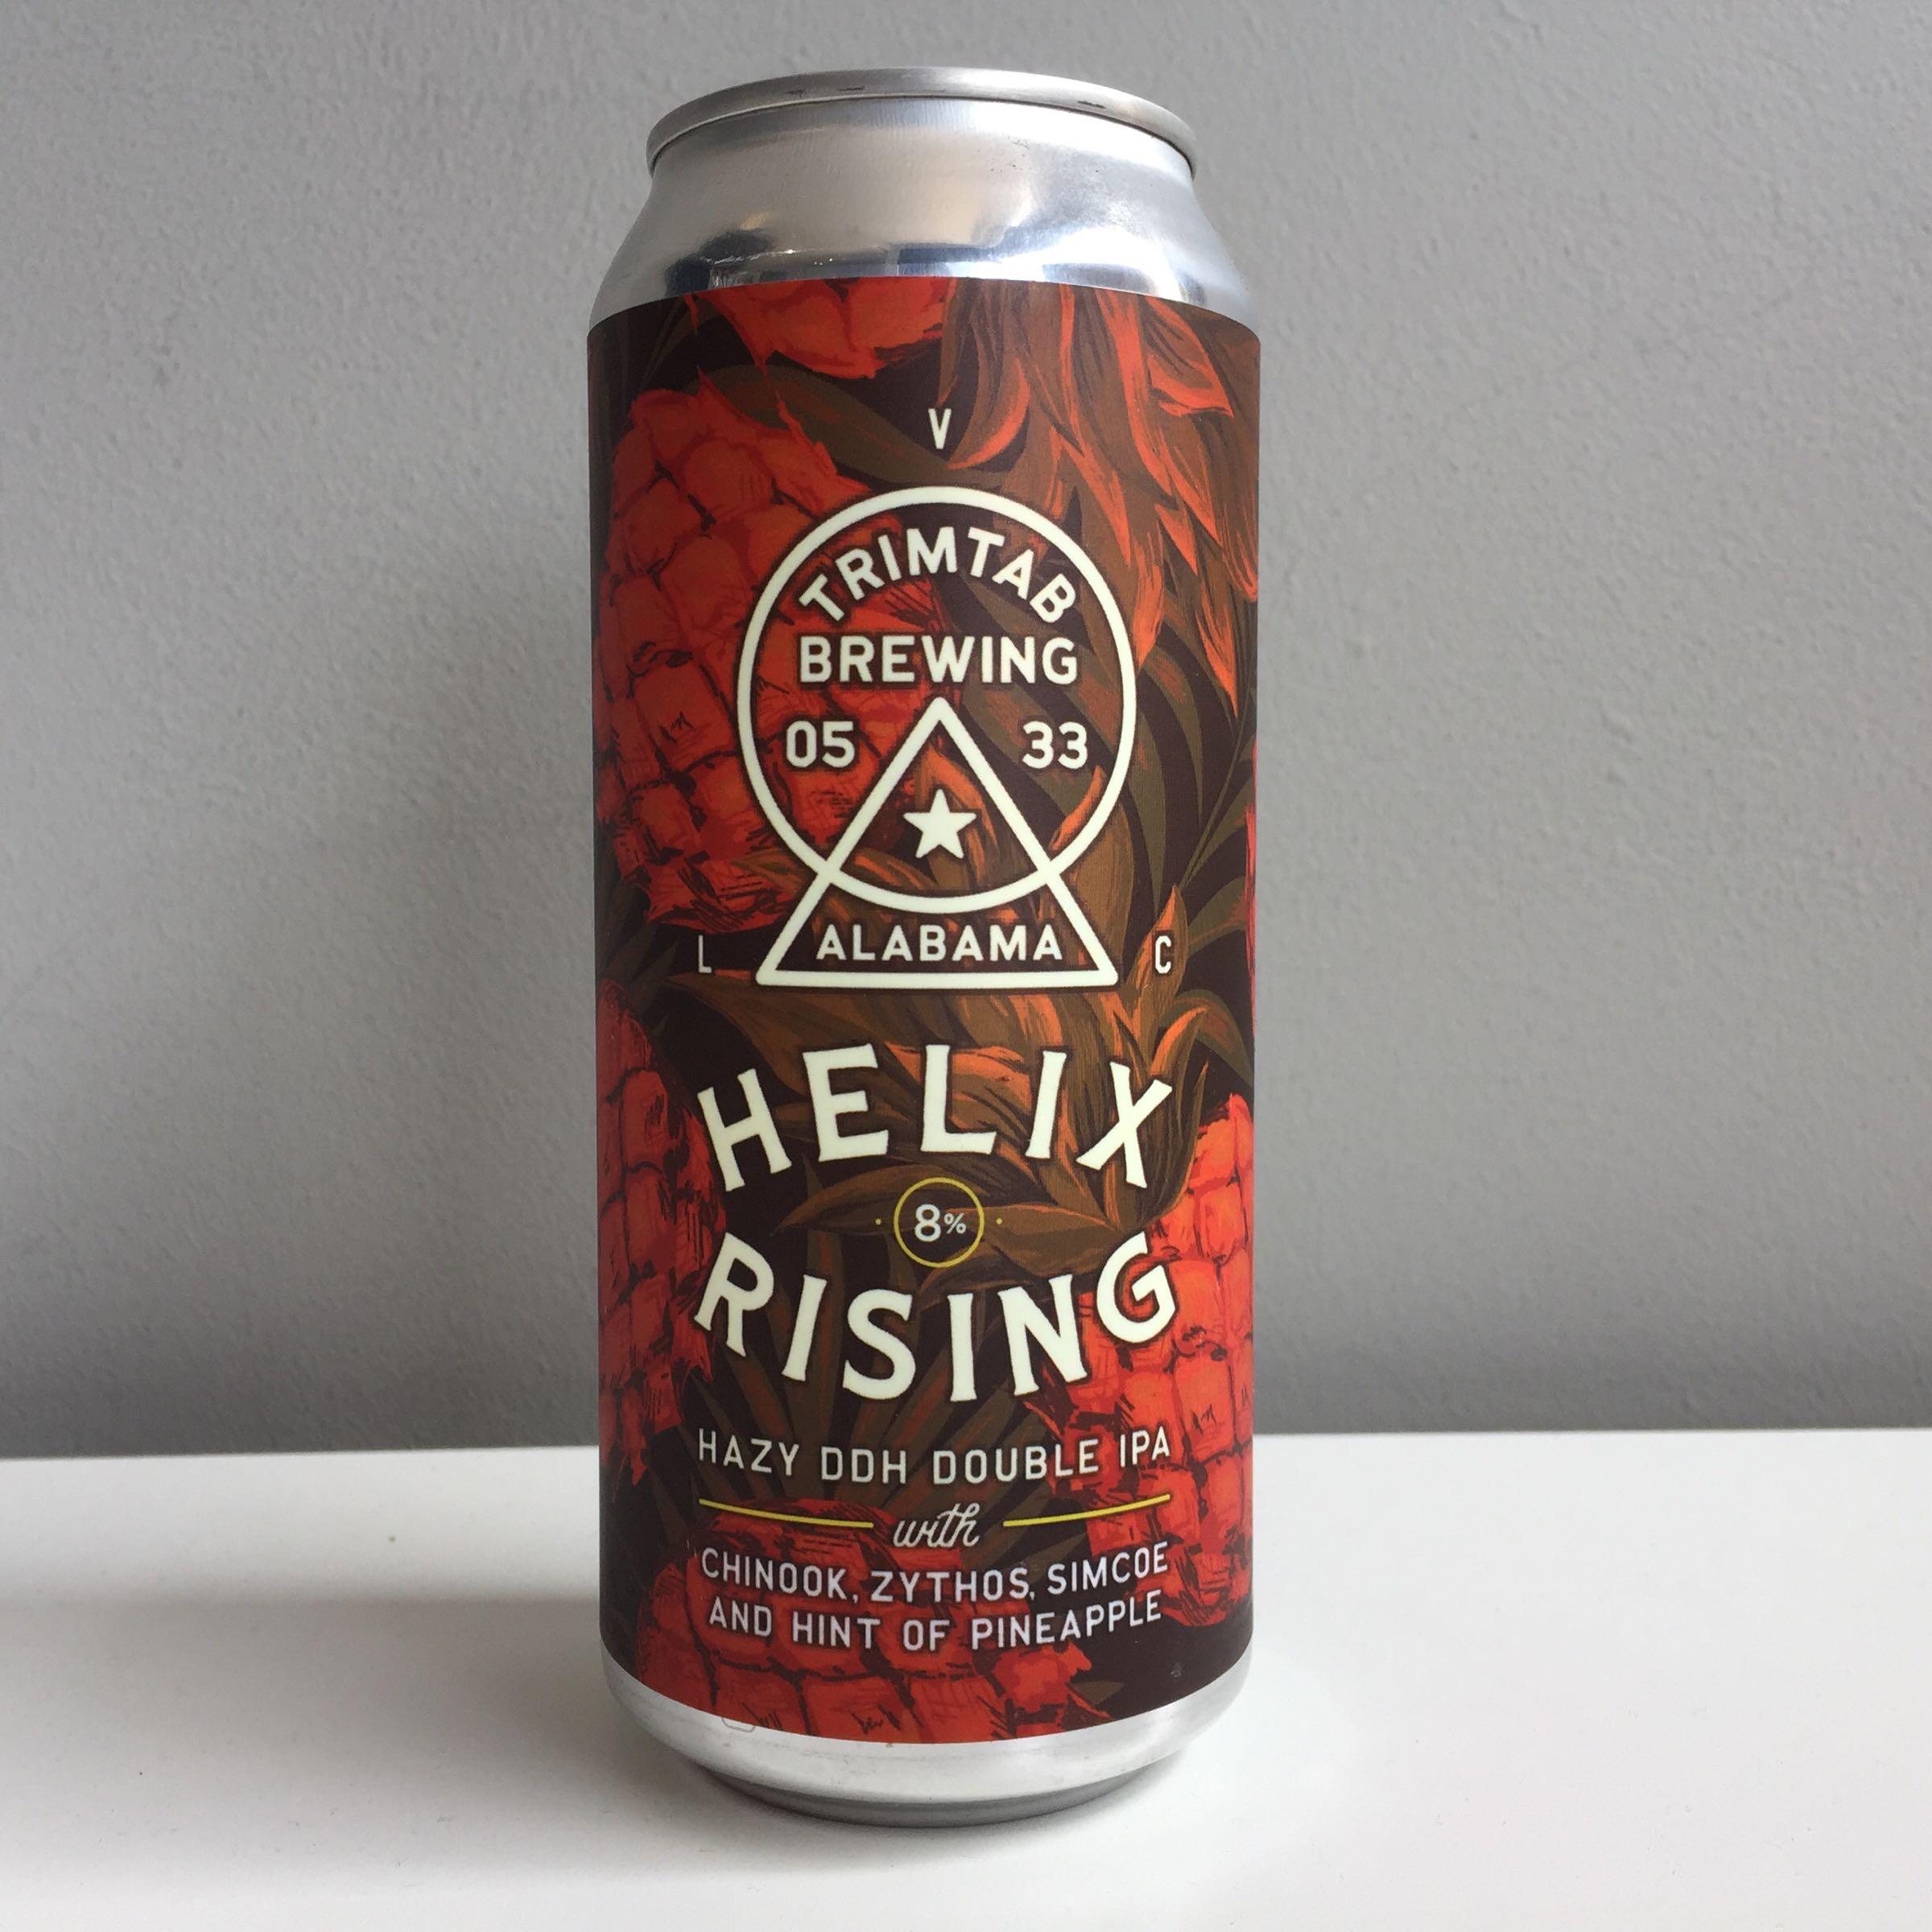 Trimtab Brewing 'Helix Rising' Hazy DDH DIPA 440ml 8% ABV